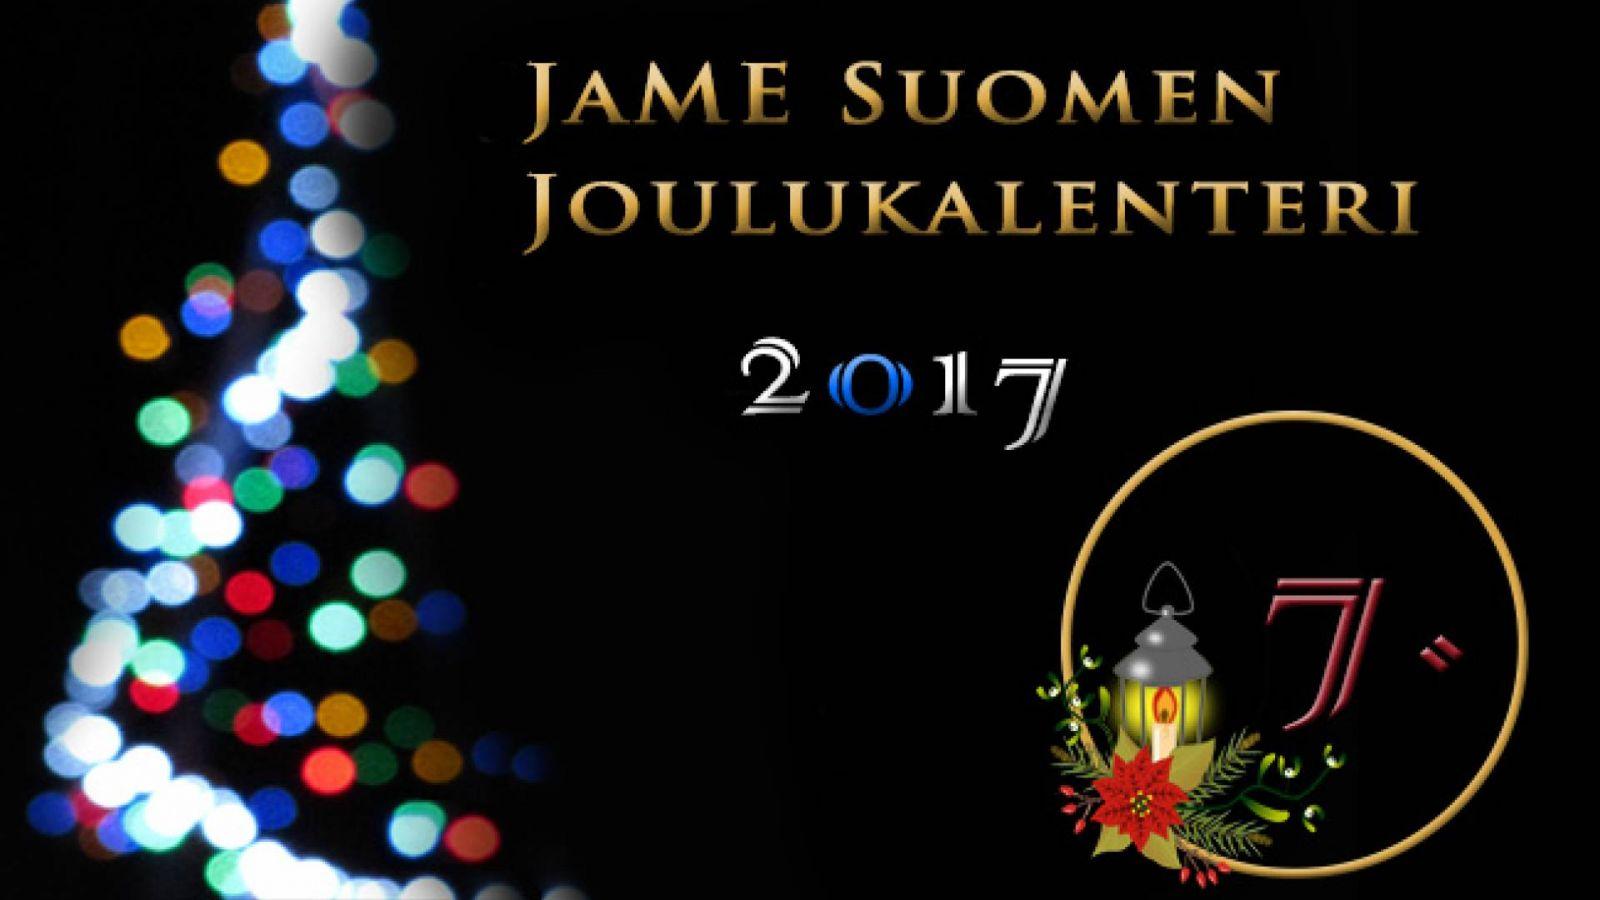 JaME Suomen joulukalenterin 7. luukku © Nipsu